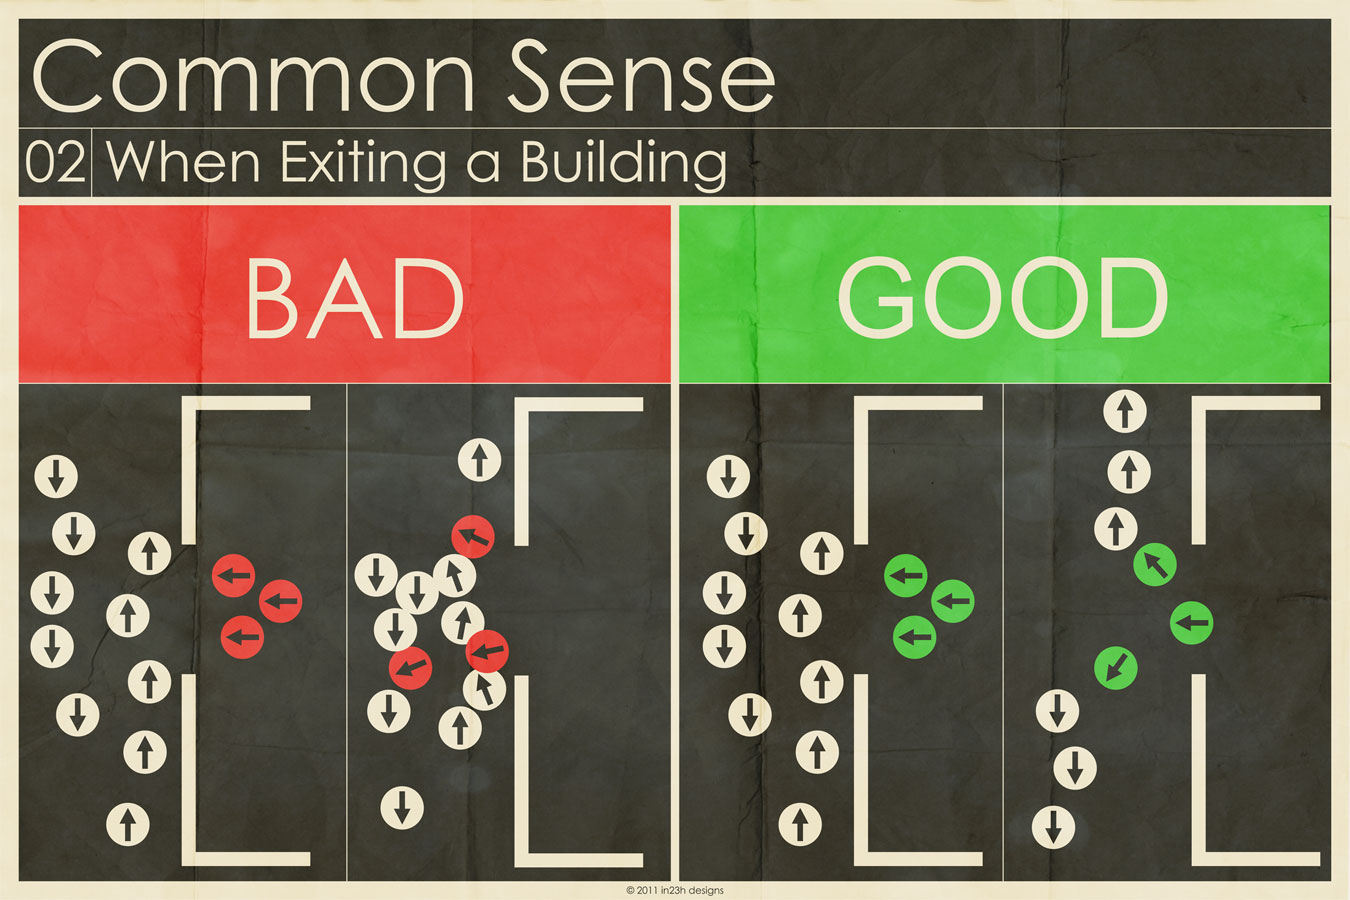 Common Sense 02 - Building